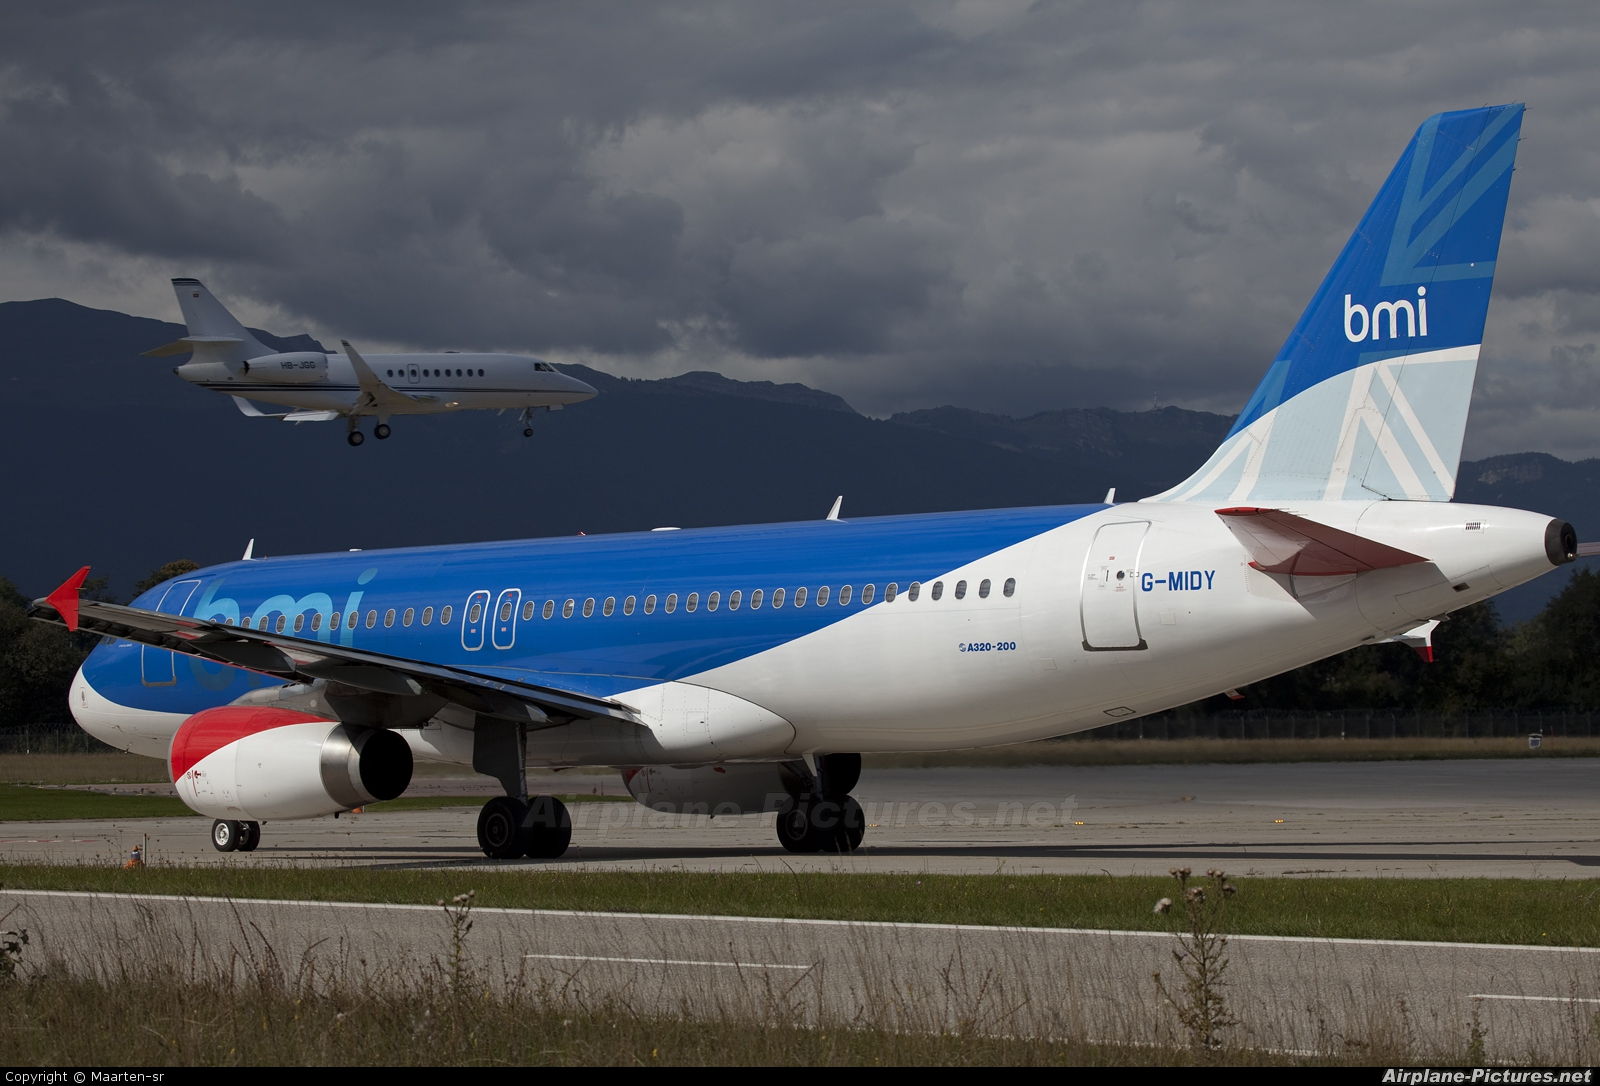 BMI British Midland G-MIDY aircraft at Geneva Intl